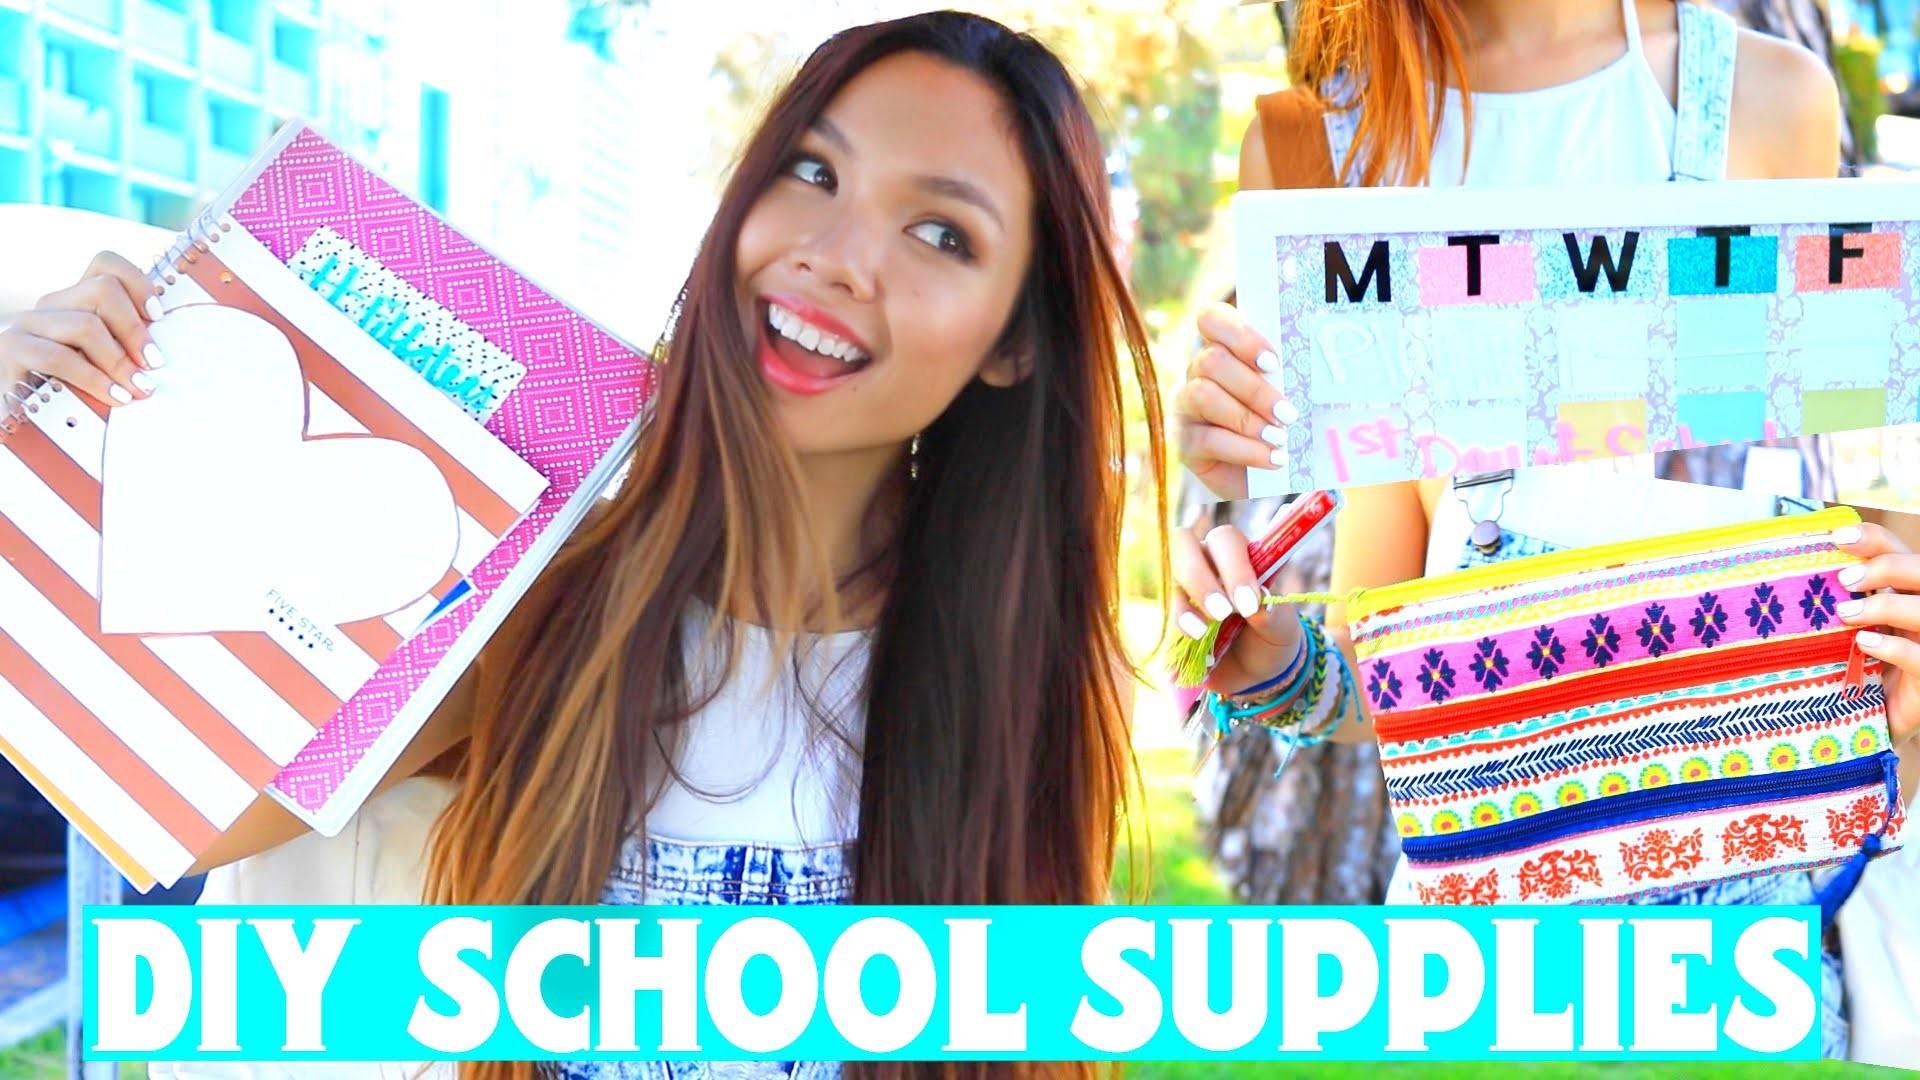 DIY School Supplies & Organization Ideas! | Back to School 2015 +Giveaway!!